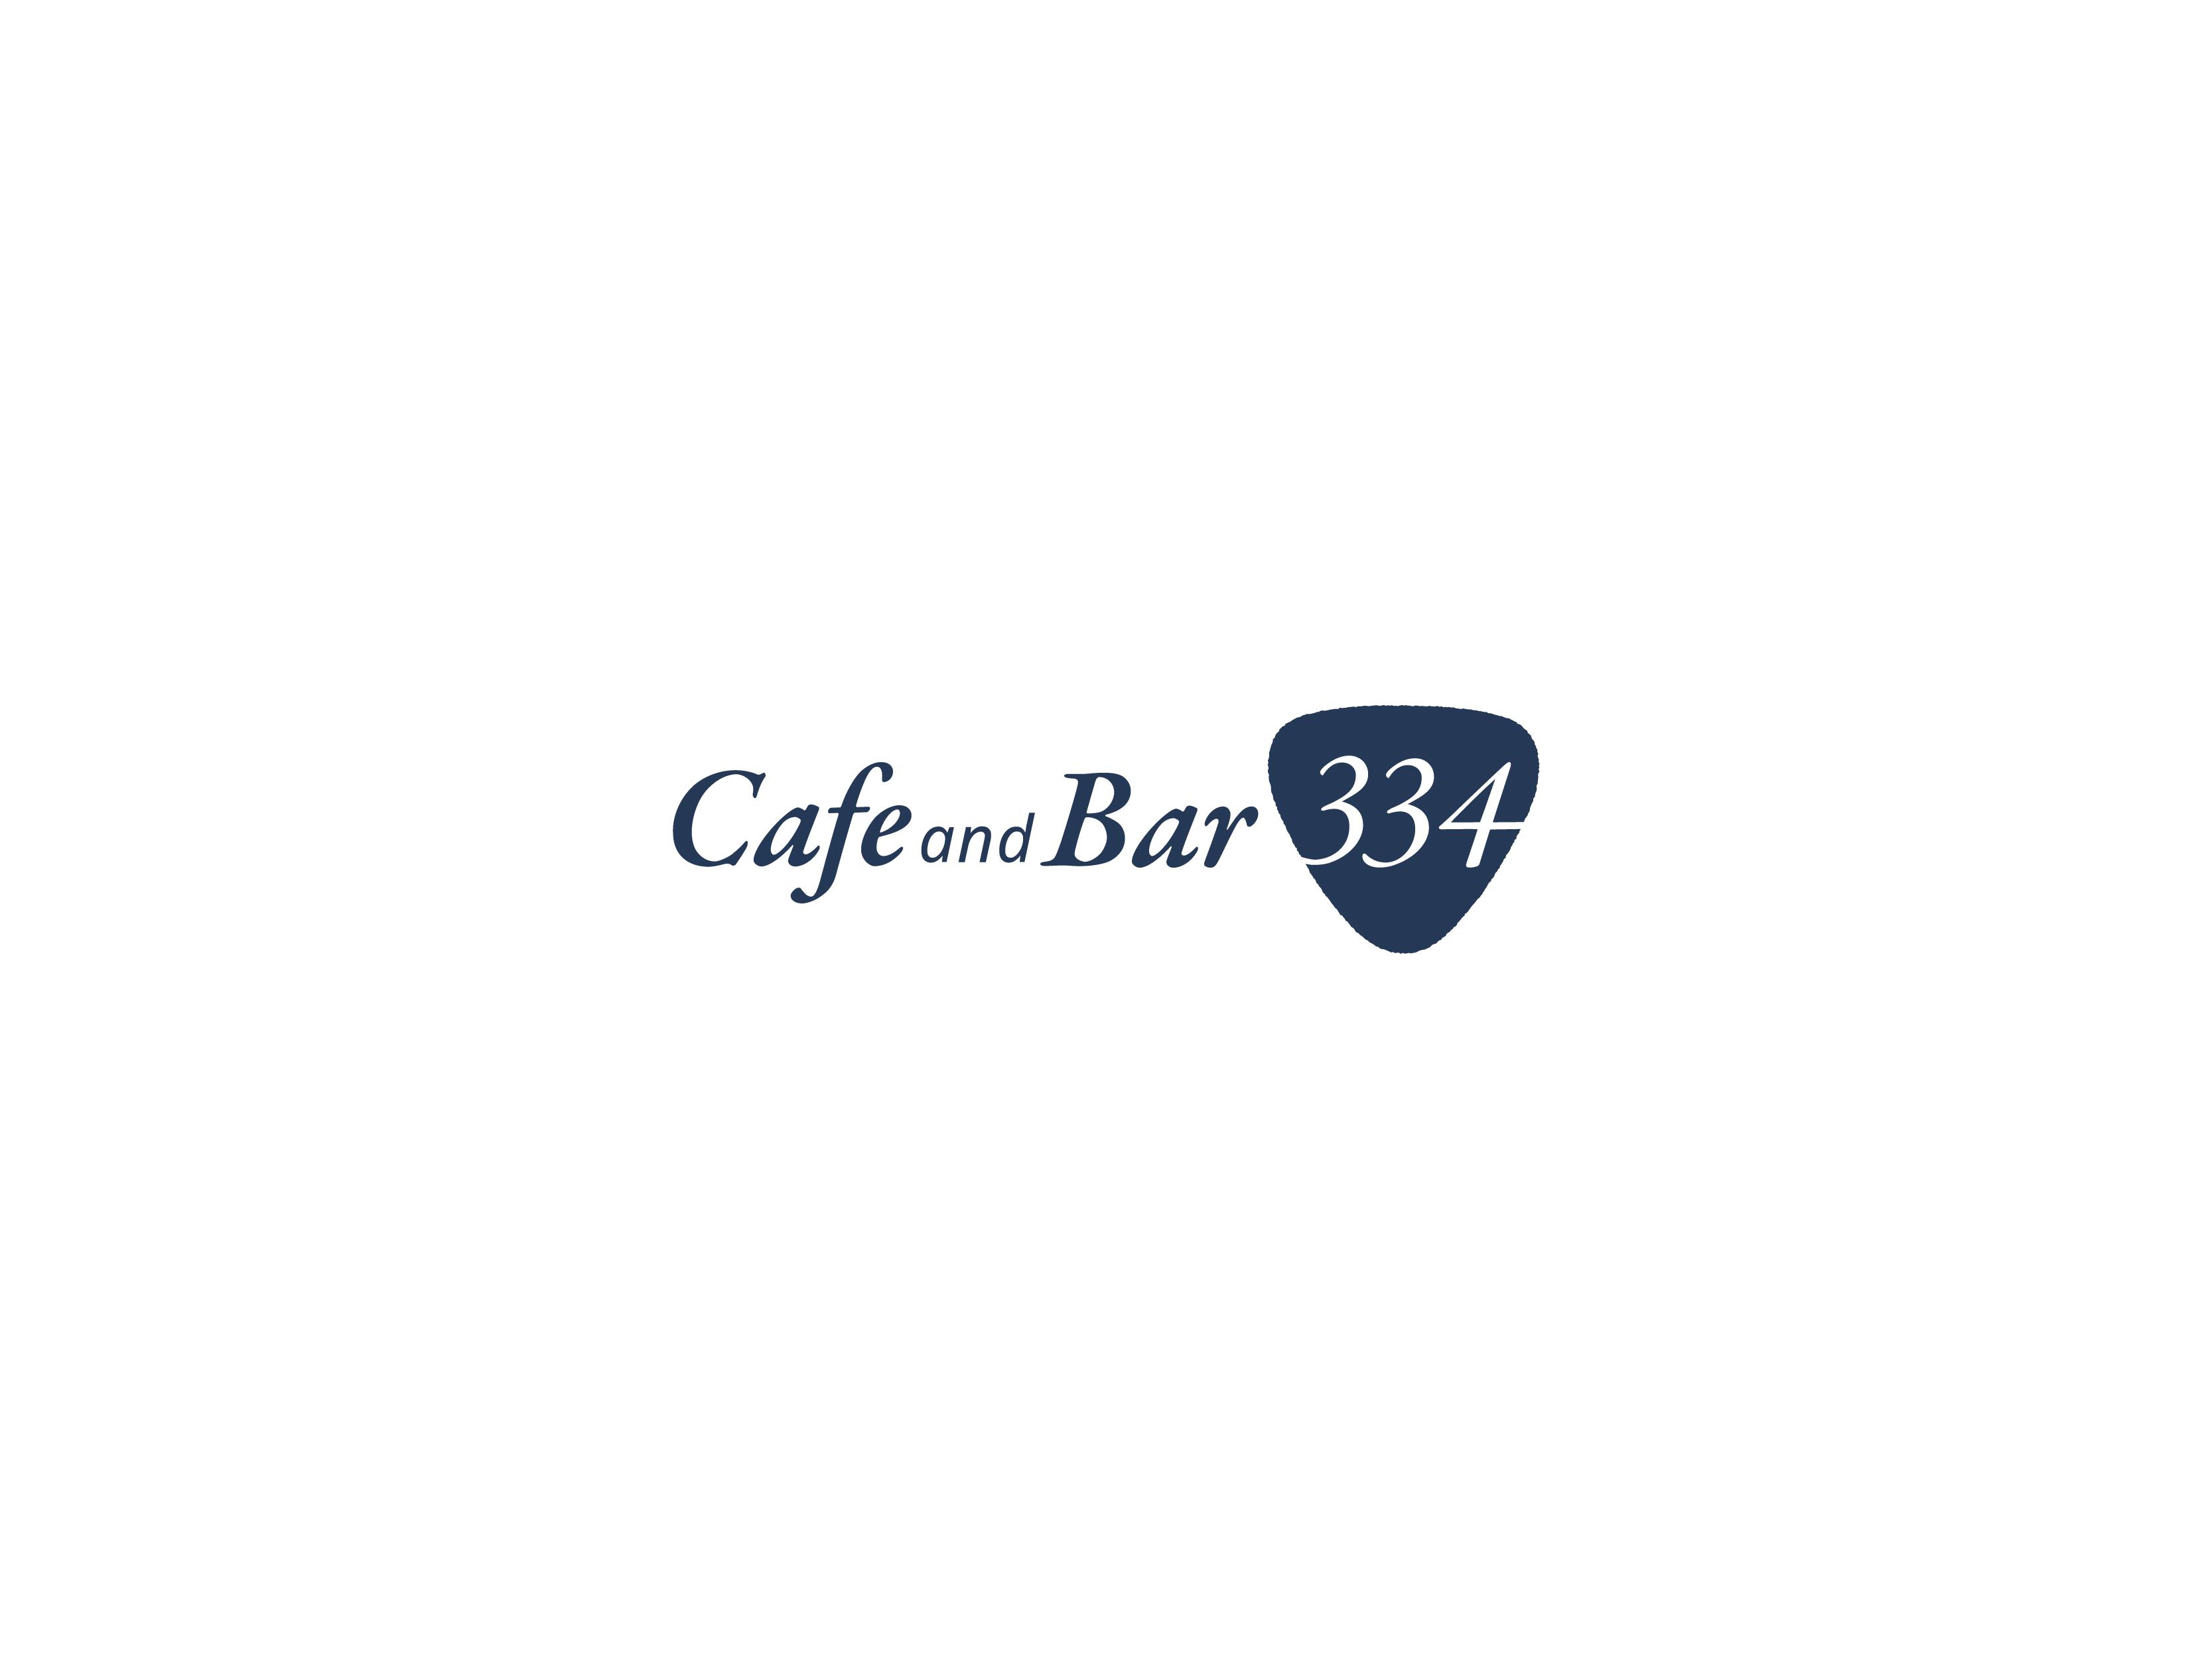 <span>logo</span><br>知床北こぶしグループ<br>カフェ&バル 334